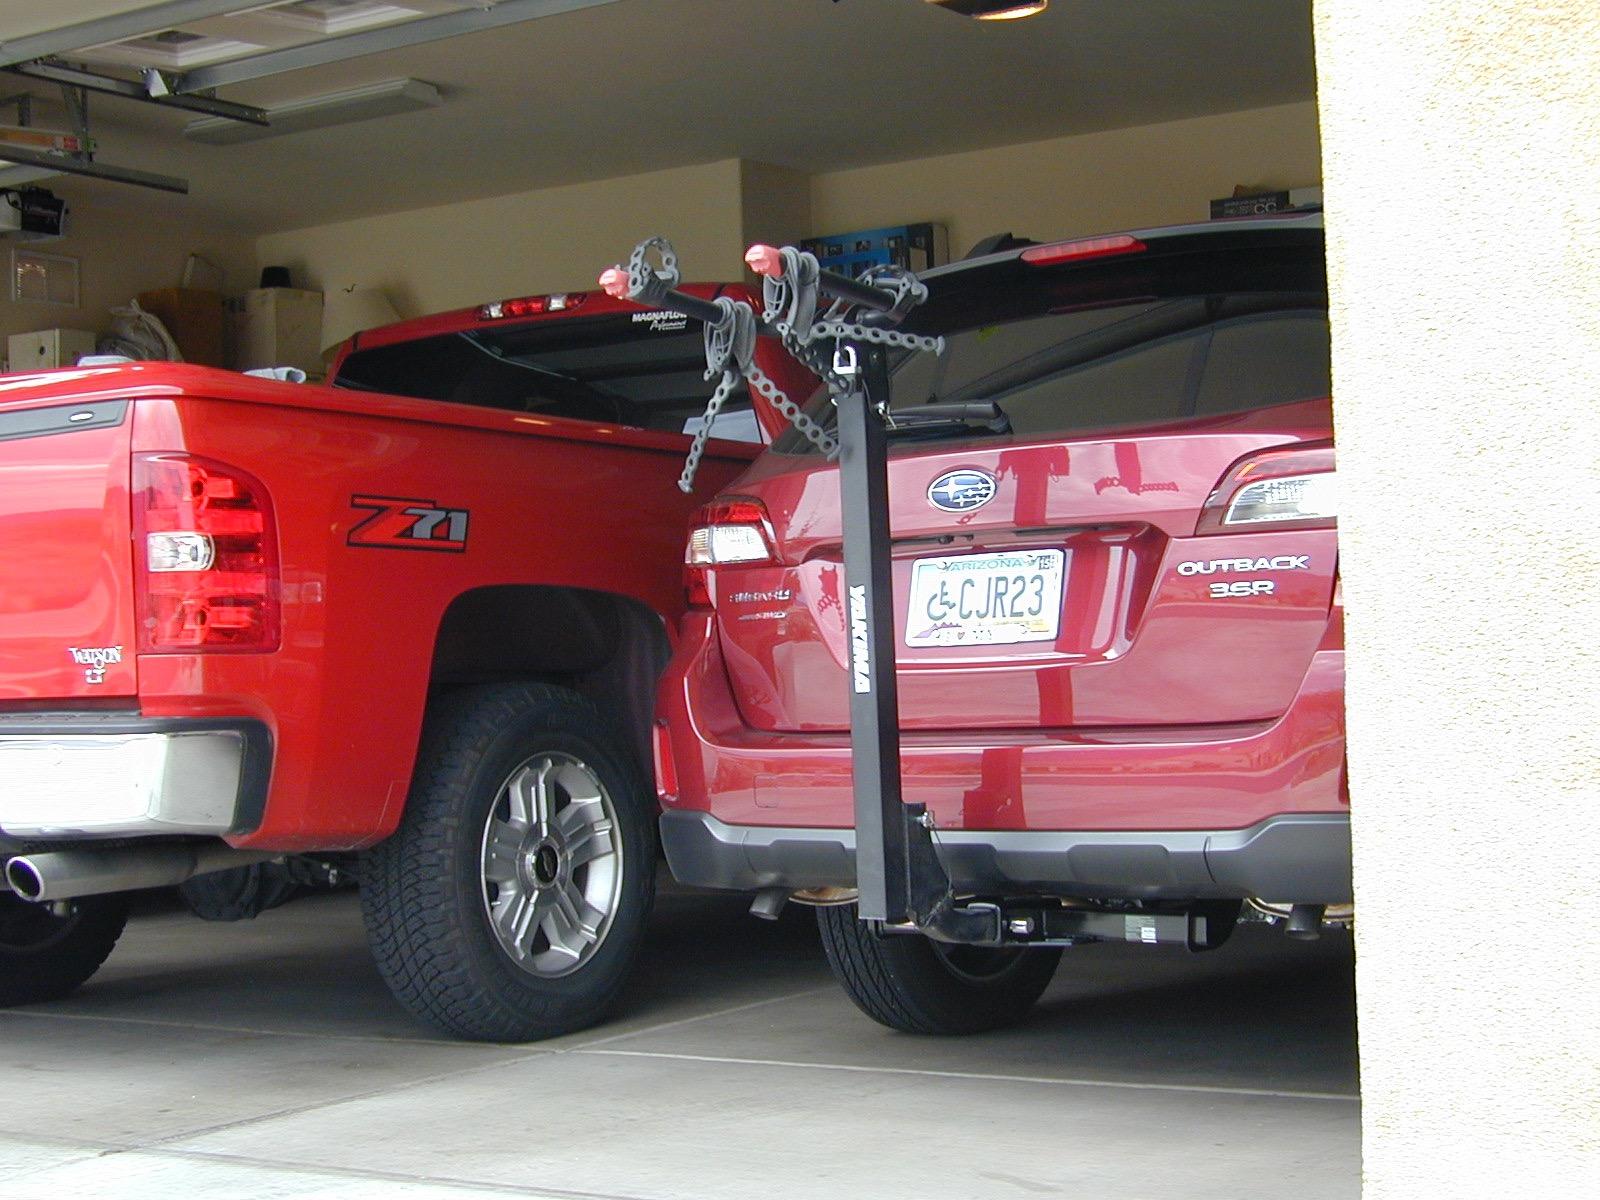 2008 Trailer Wiring Help Subaru Outback Subaru Outback Forums ... on u-haul trailer wiring kit, toyota wiring harness, u-haul trailer light harness, u-haul wiring adapter, camper wiring harness, diesel wiring harness, u-haul wiring harness diagram,